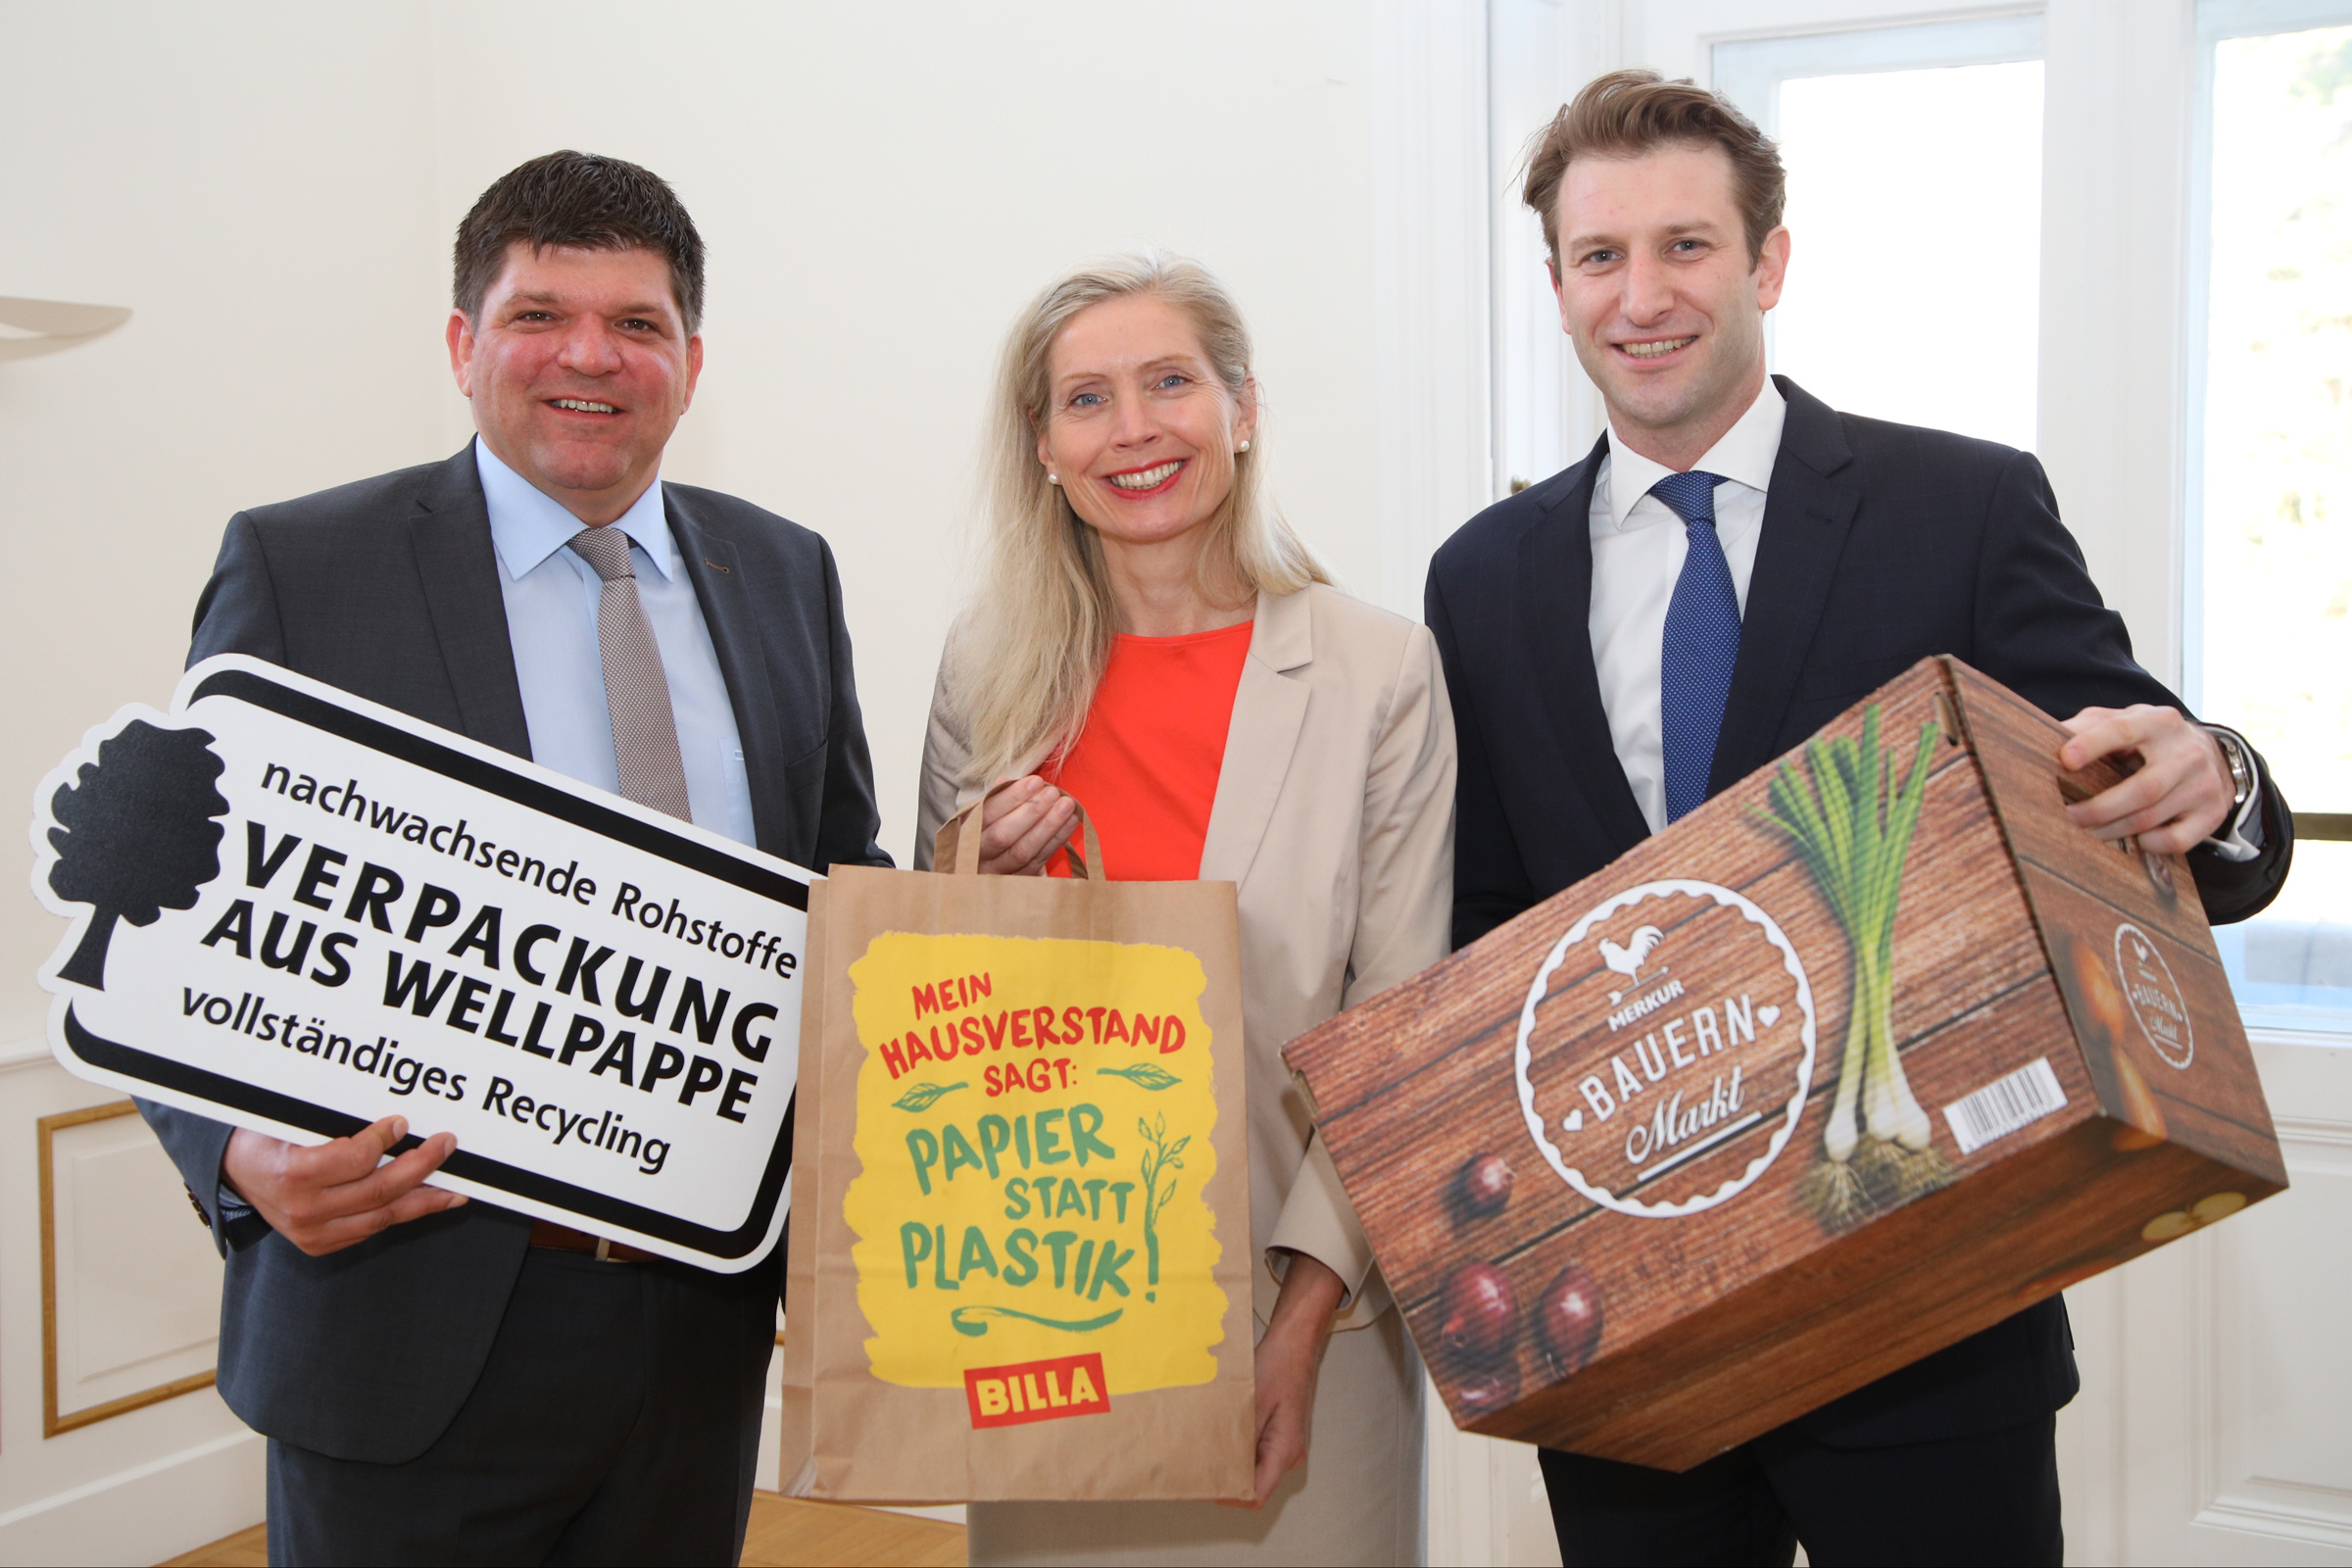 Wellpappe Pressegespräch 2017: Stephan Kaar, Tanja Dietrich-Hübner, REWE Group, Max Hölbl, Forum Wellpappe Austria © L. Schedl